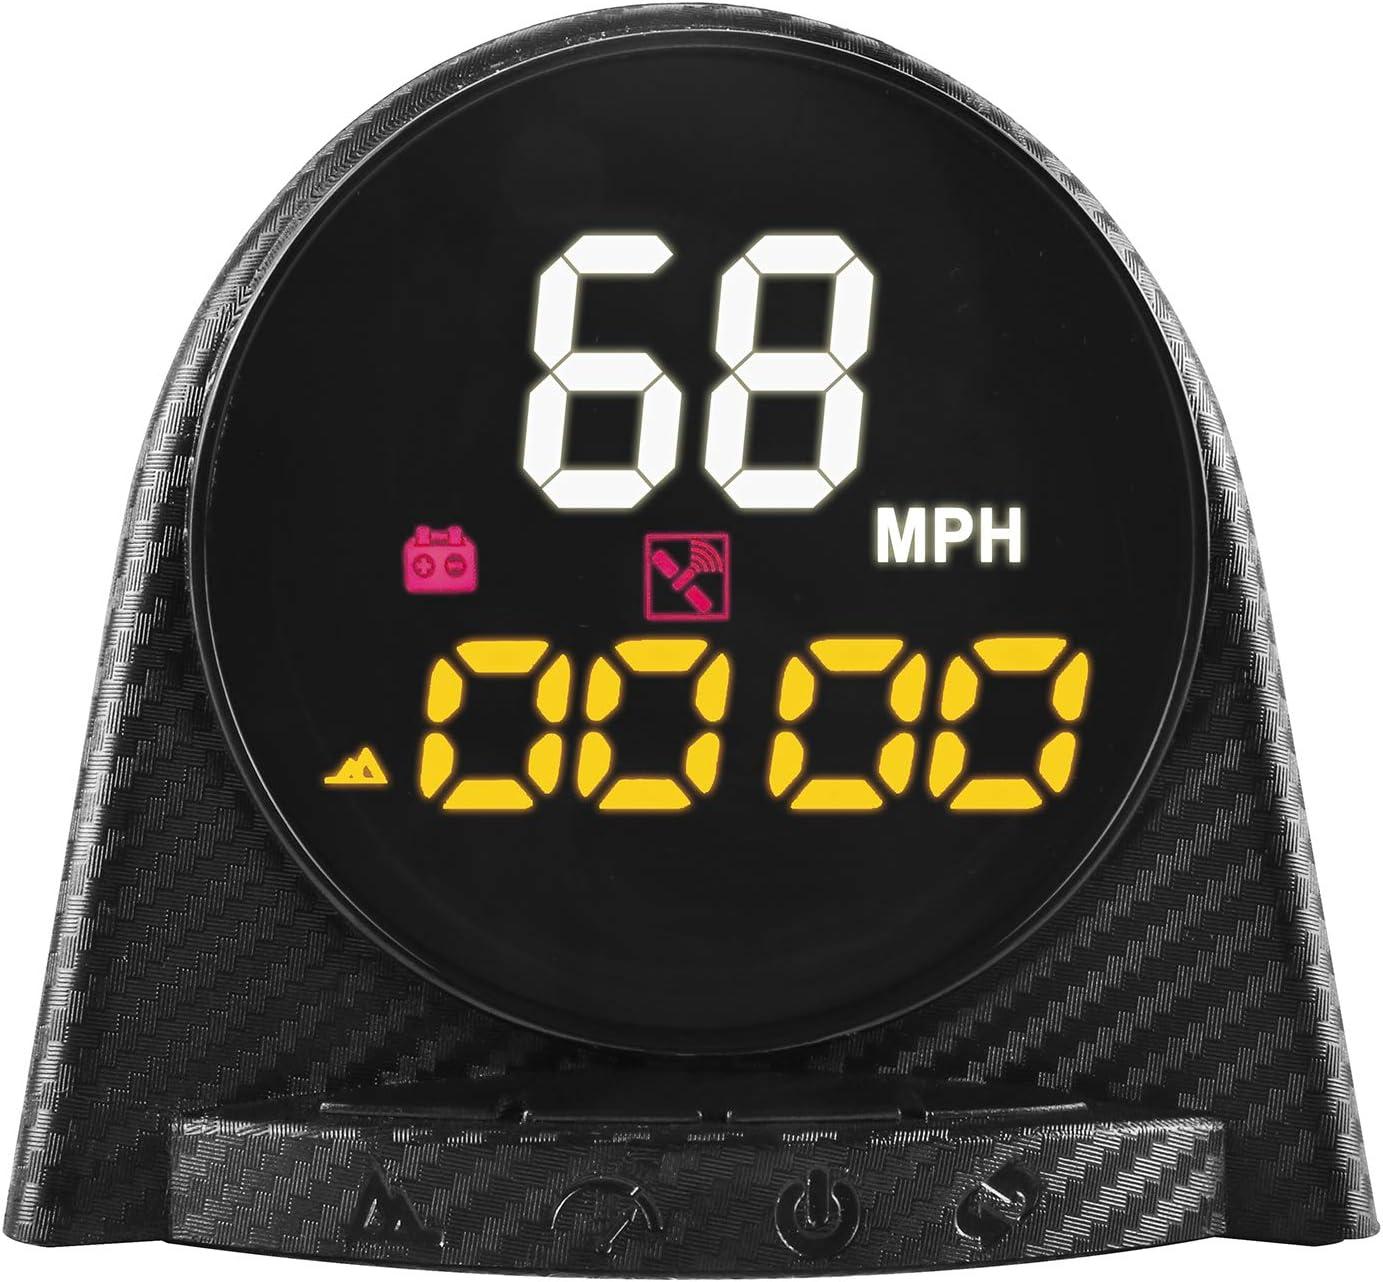 Car Hud Miami Mall Head Up Display Digital Speedomete GPS AUTOOL DC12V 5 ☆ very popular